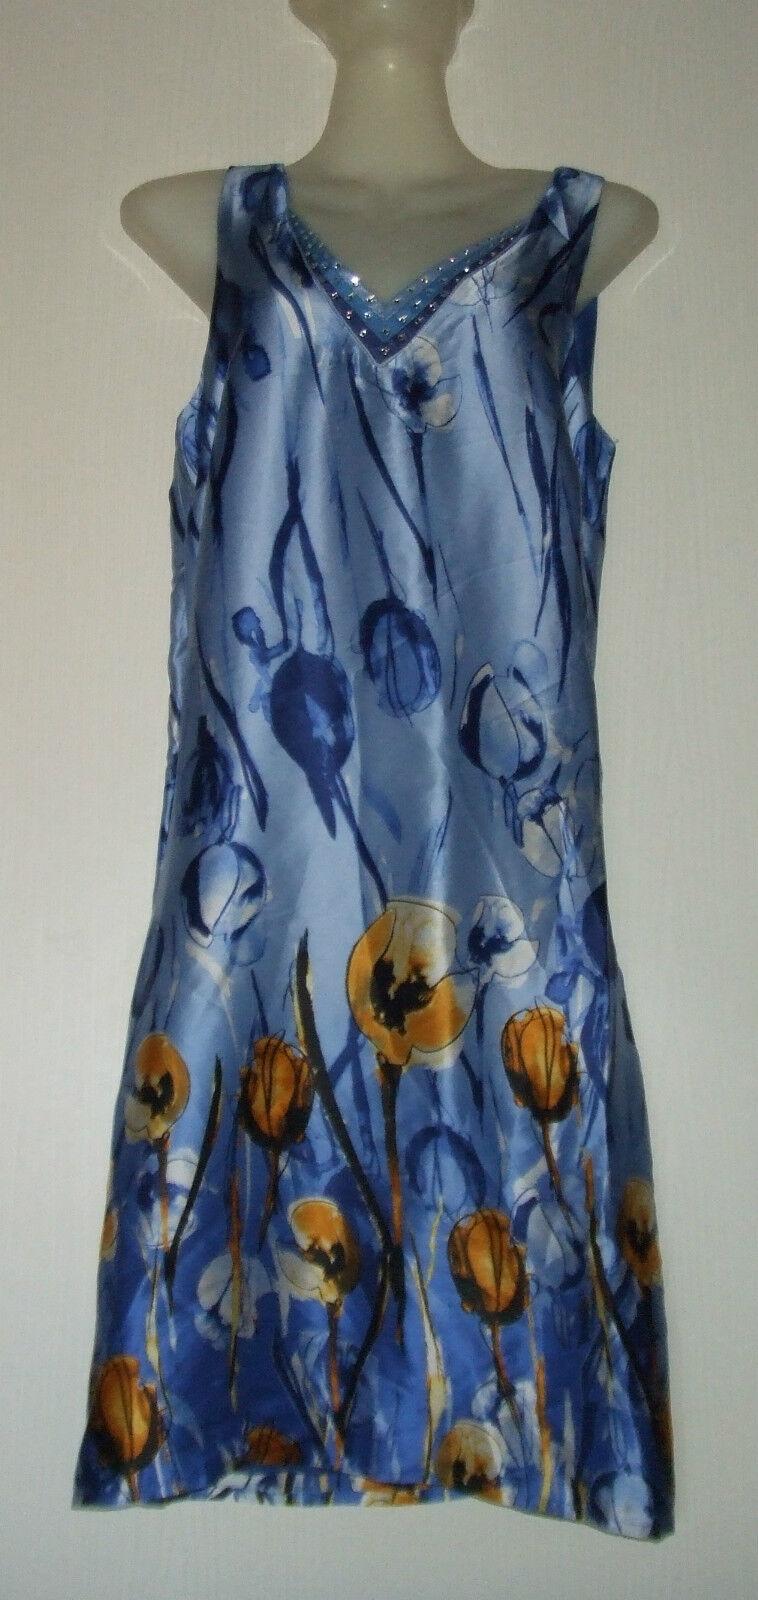 NIZA ROBE FLUIDE SHAINA 100% SOIE NATURELLE size S  (FR36-38) blue